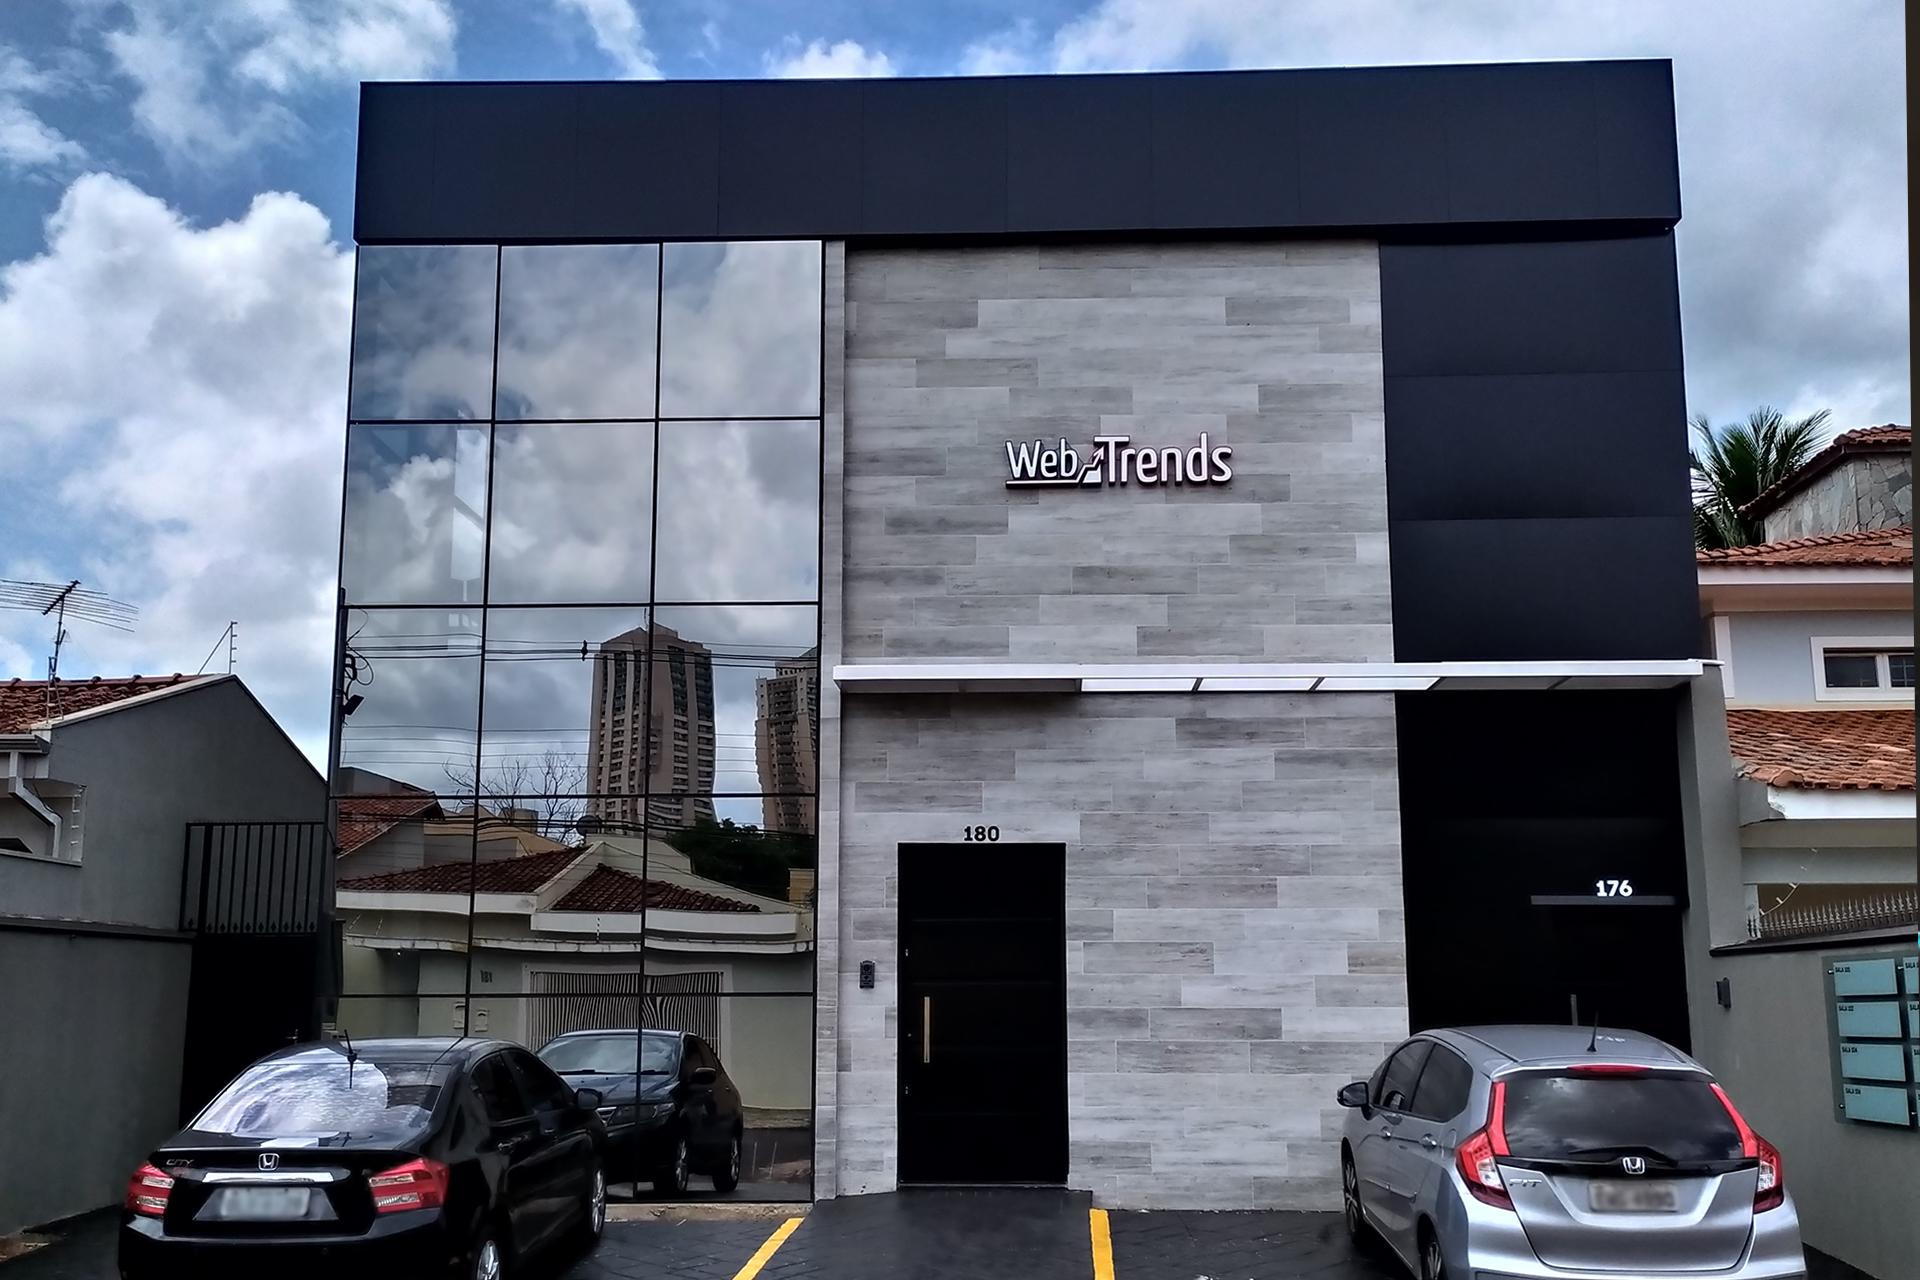 fachada da agencia webtrends